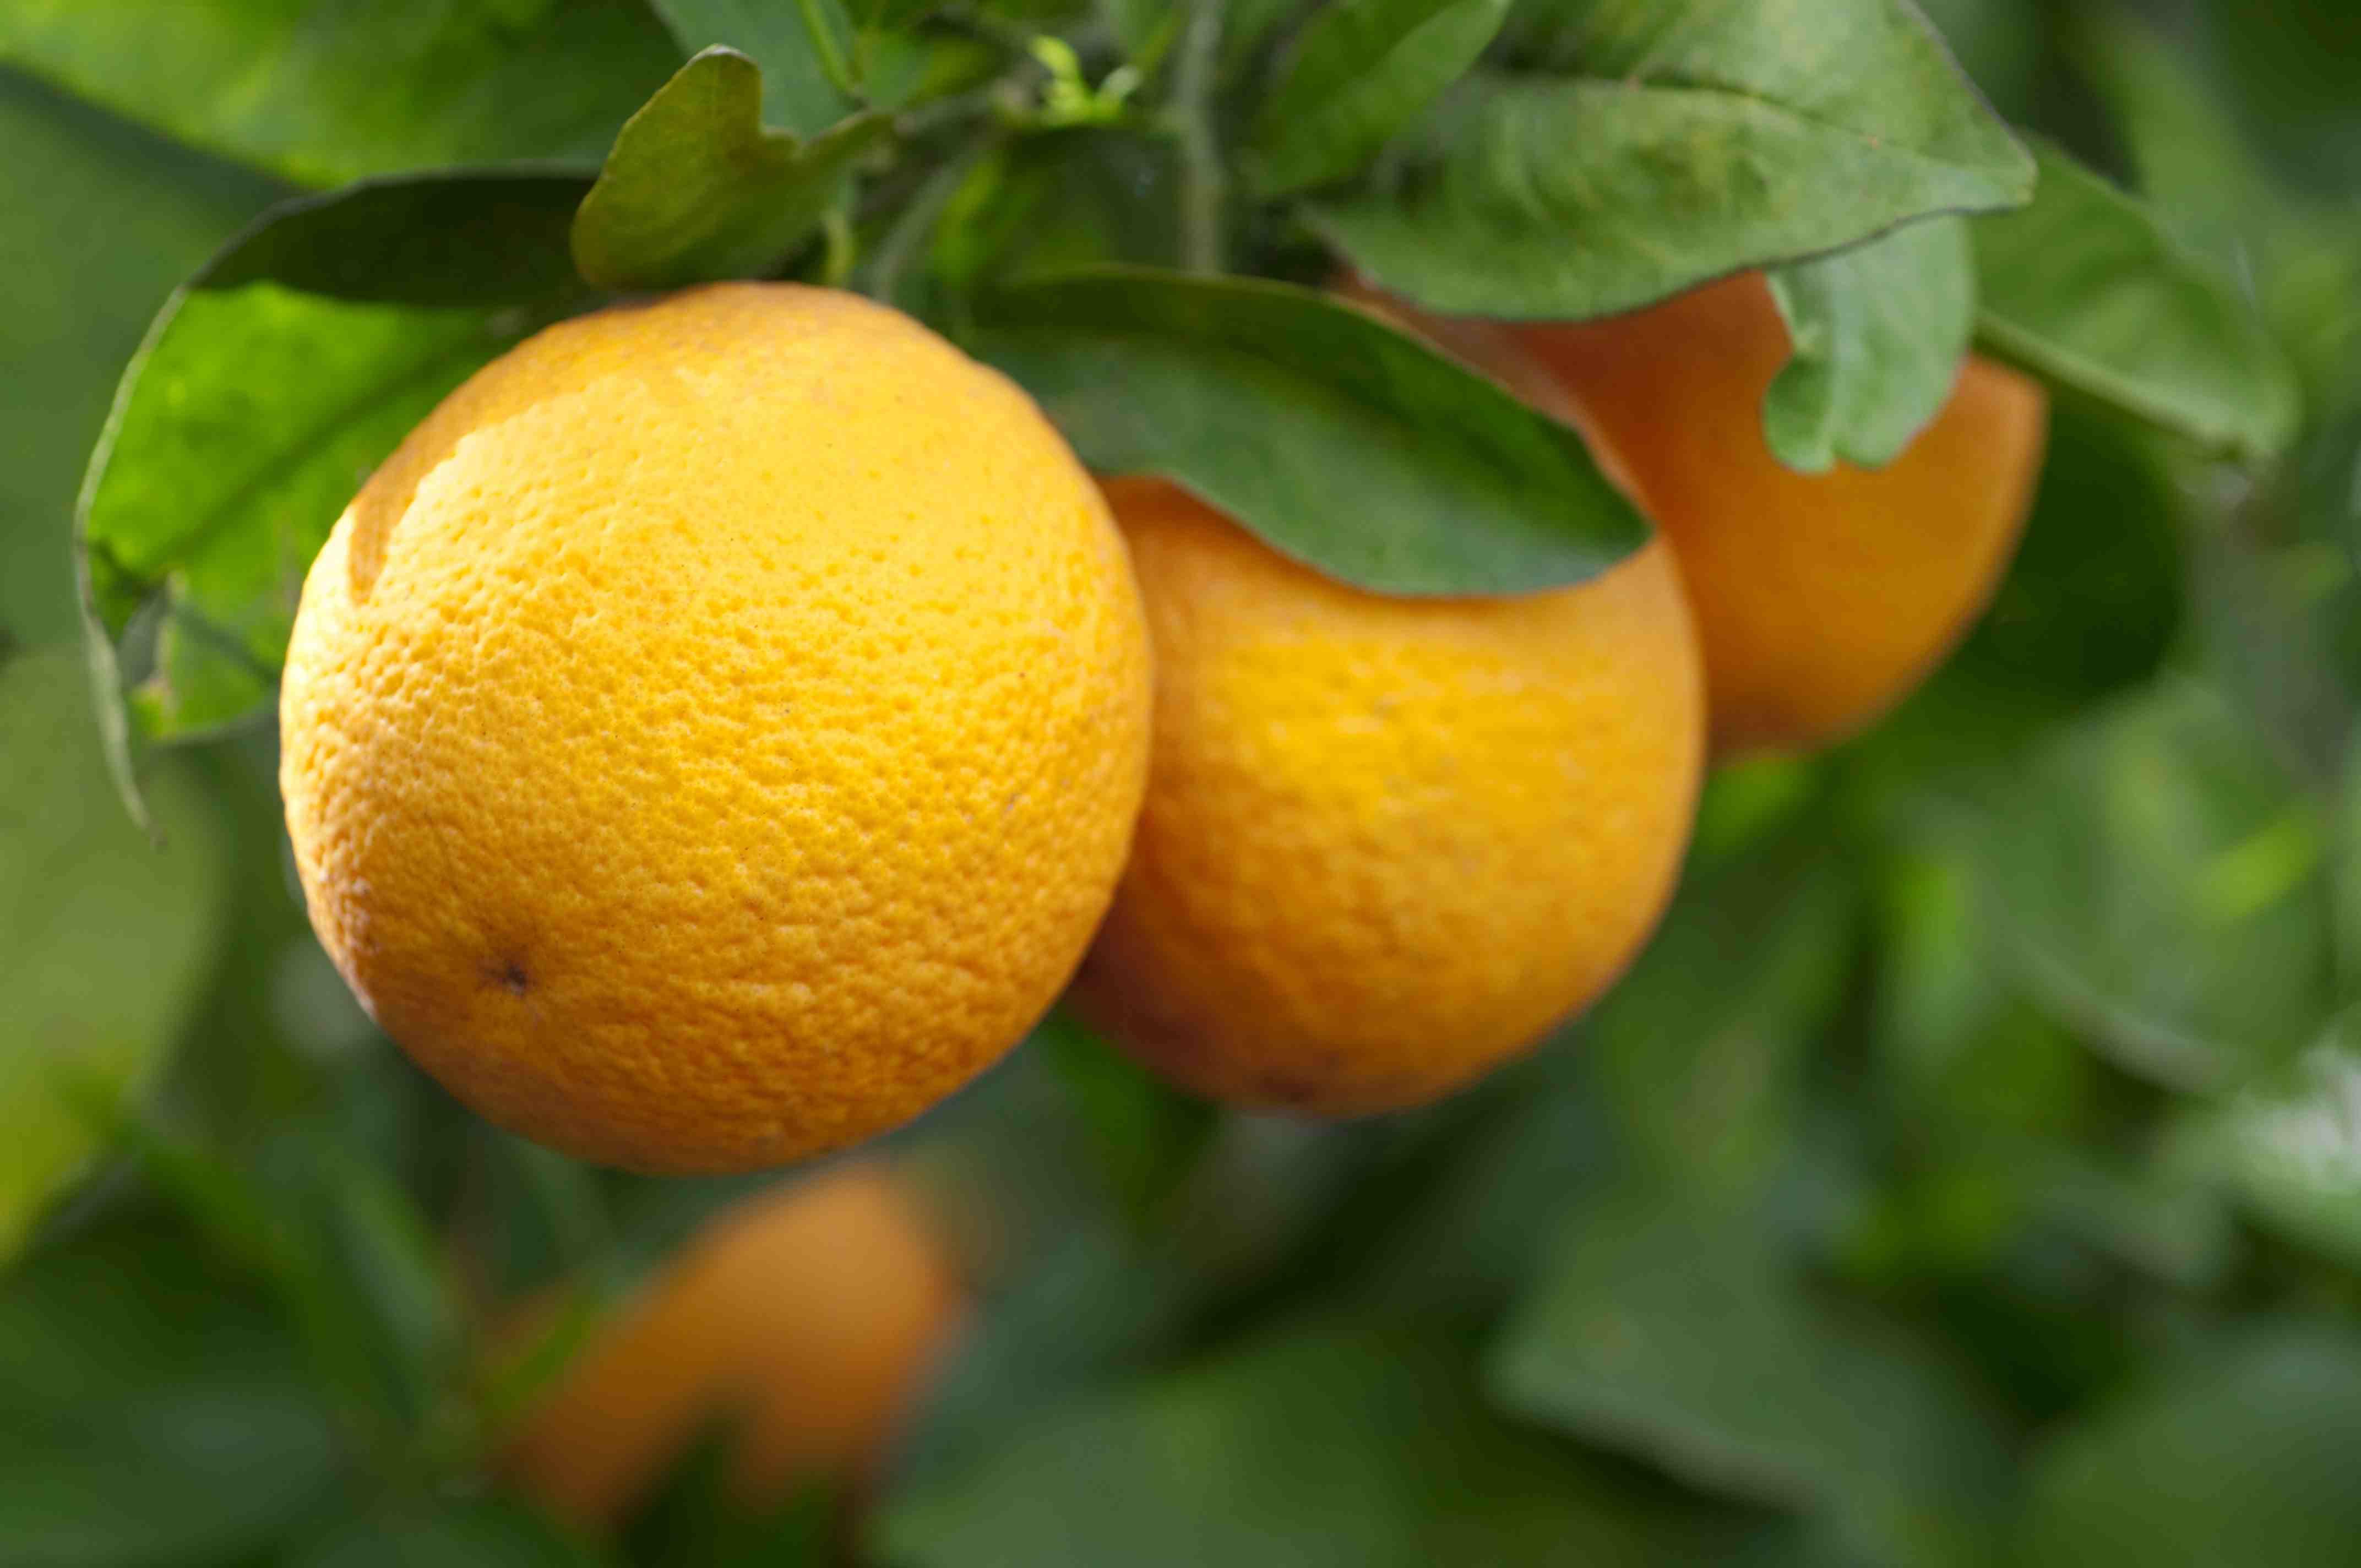 Valencia oranges on a tree